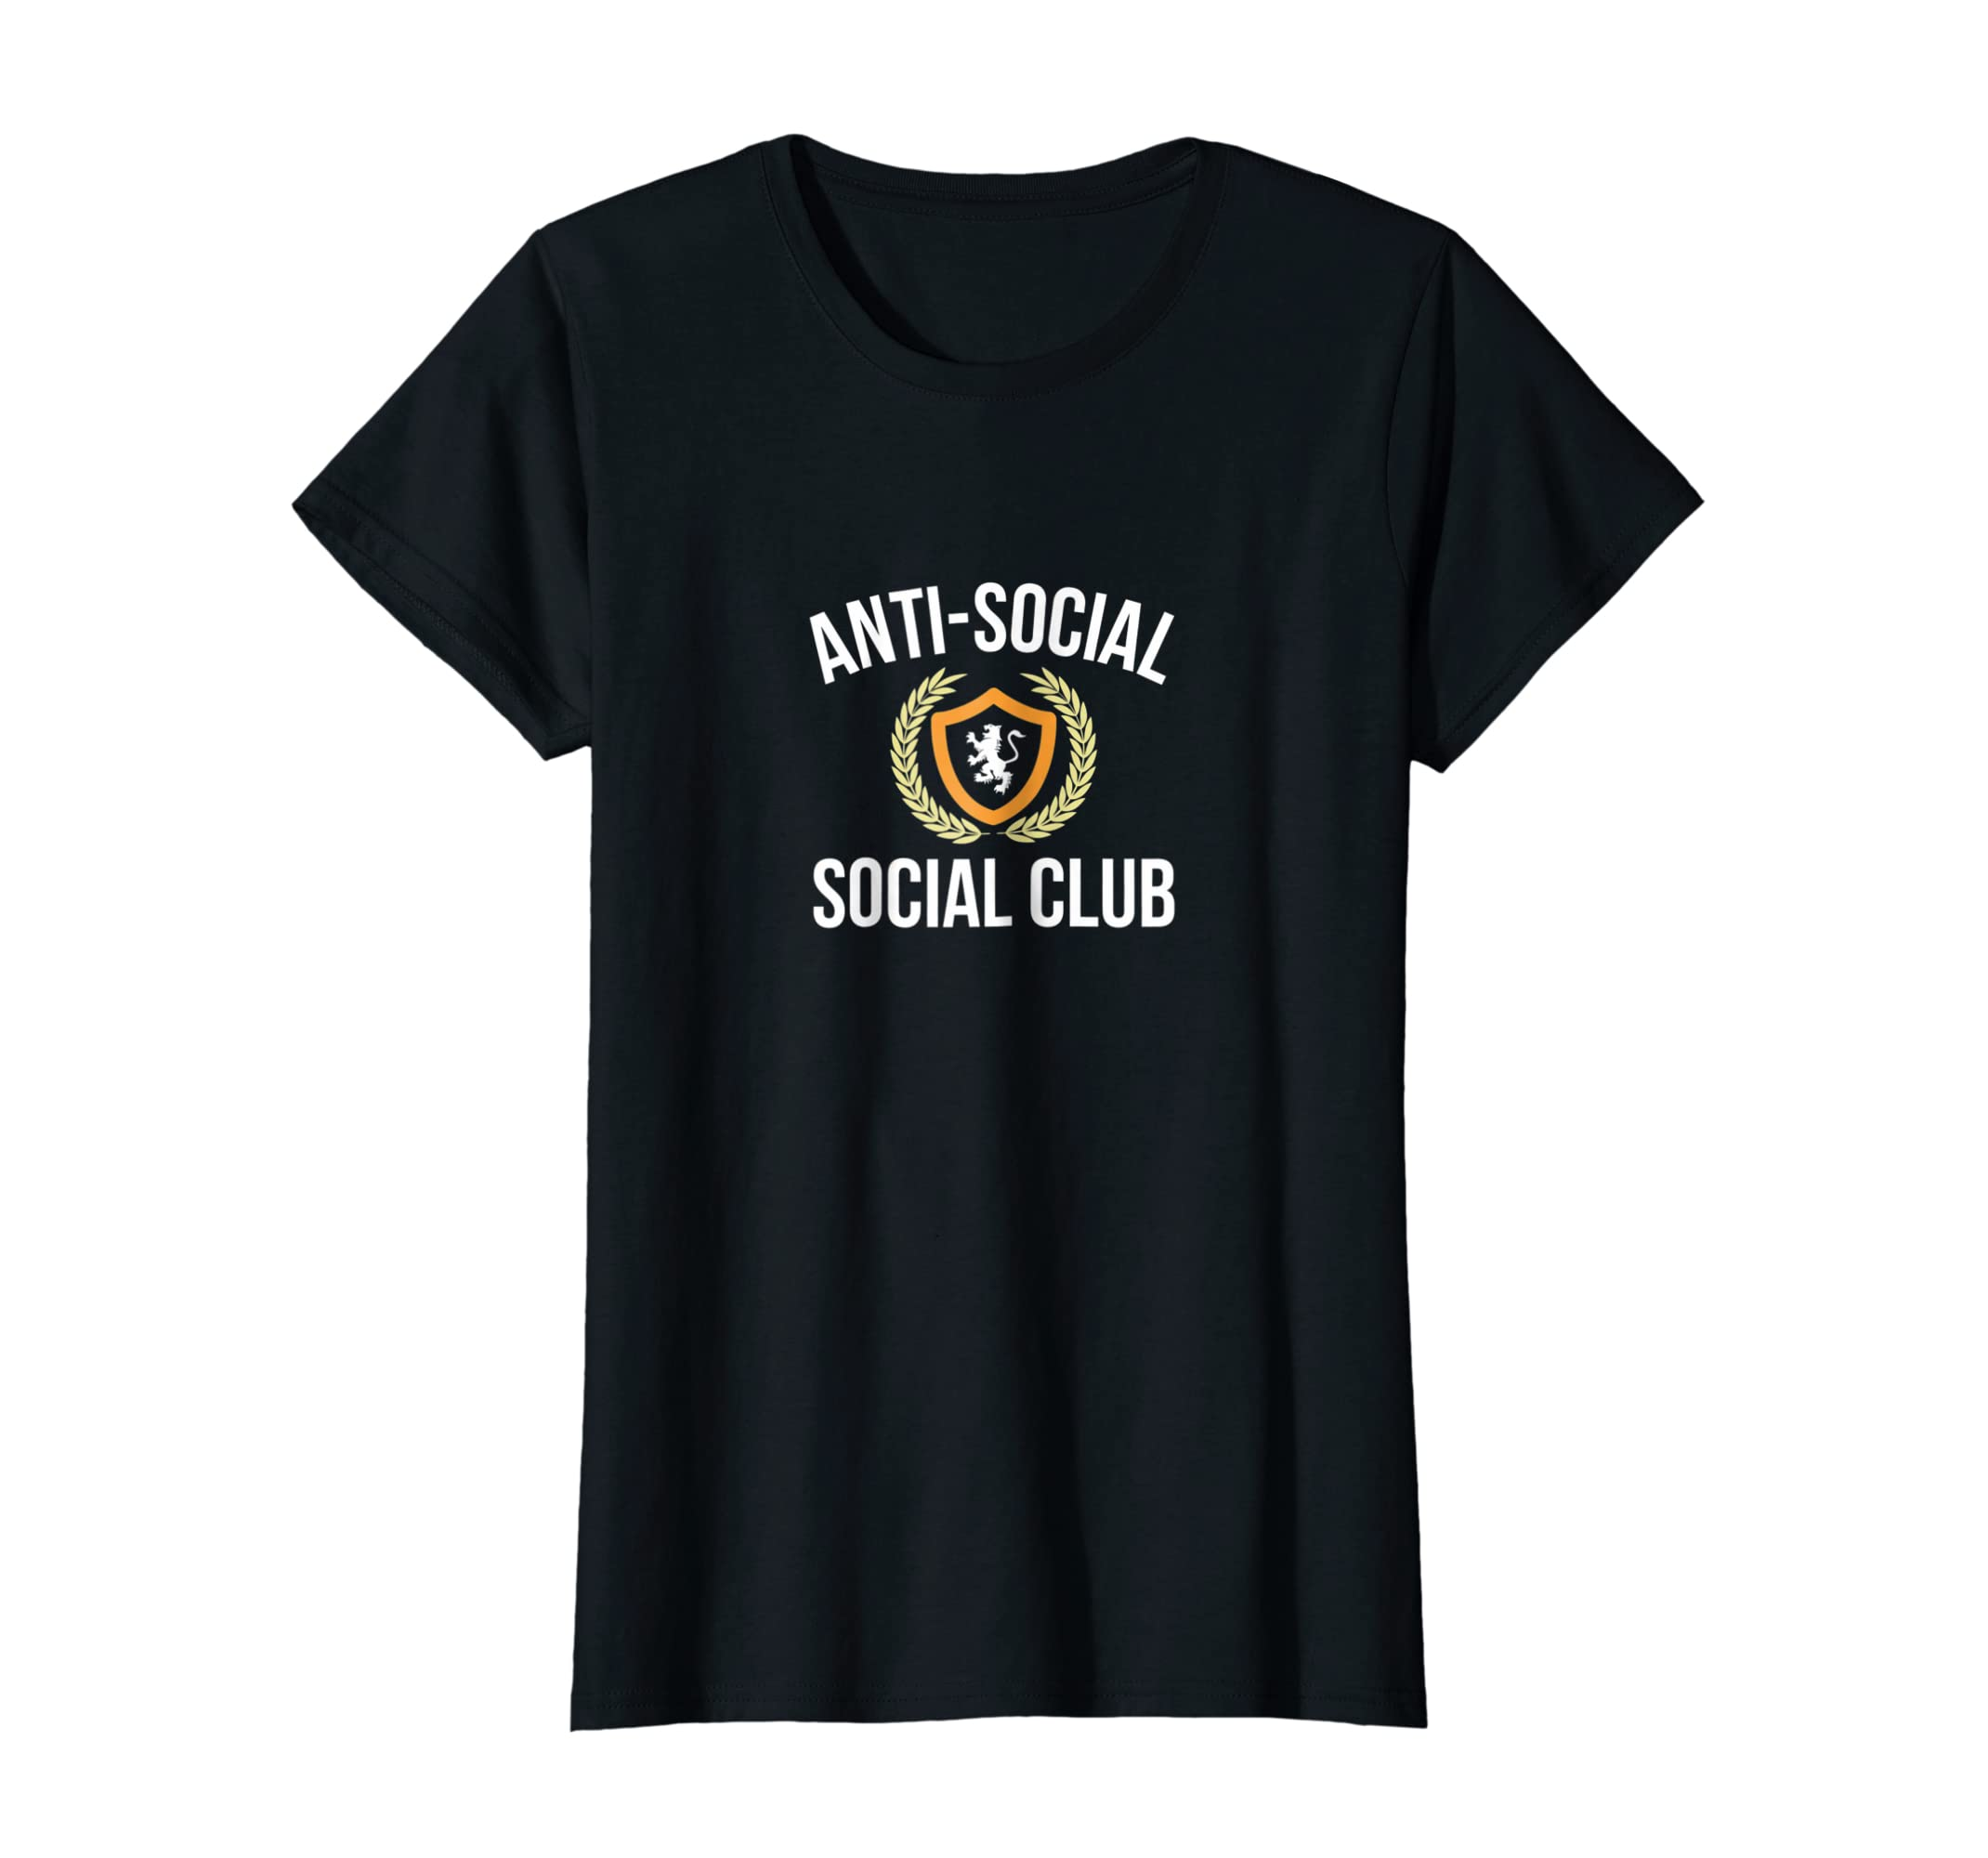 5cfd78931 Amazon.com: Anti-Social - Social Club - T-shirt: Clothing